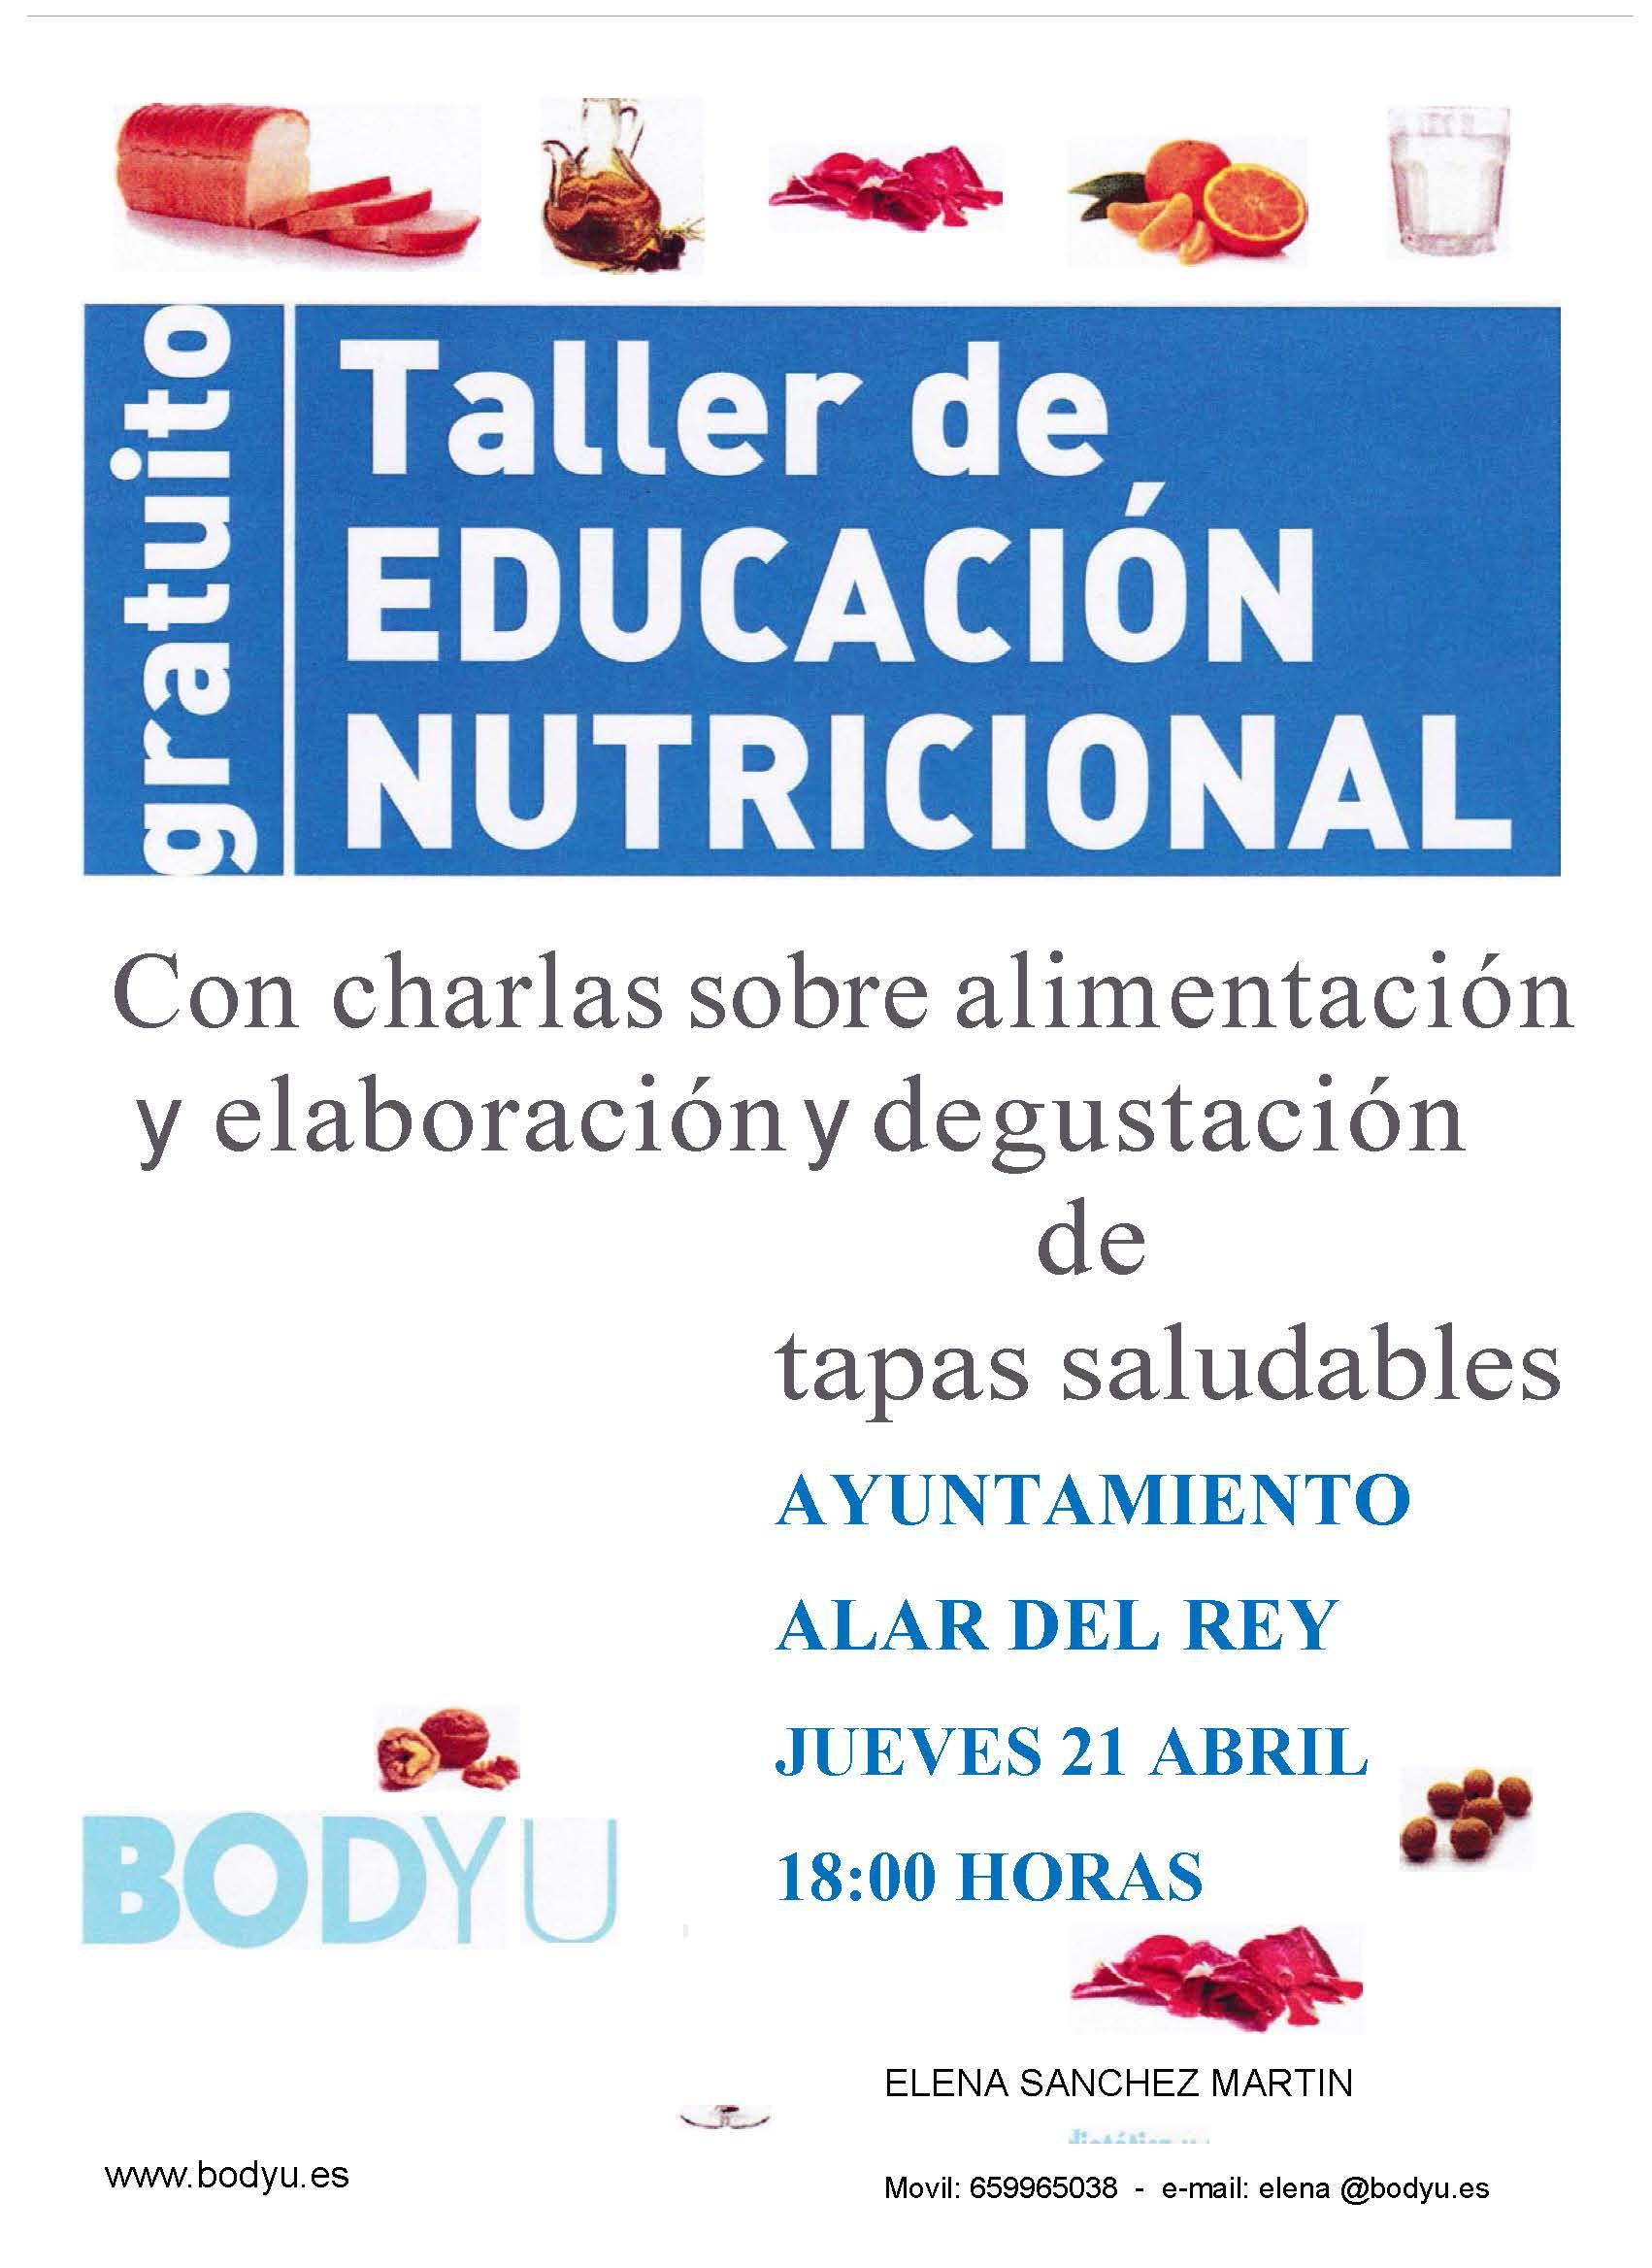 TALLER DE EDUCACIÓN NUTRICIONAL